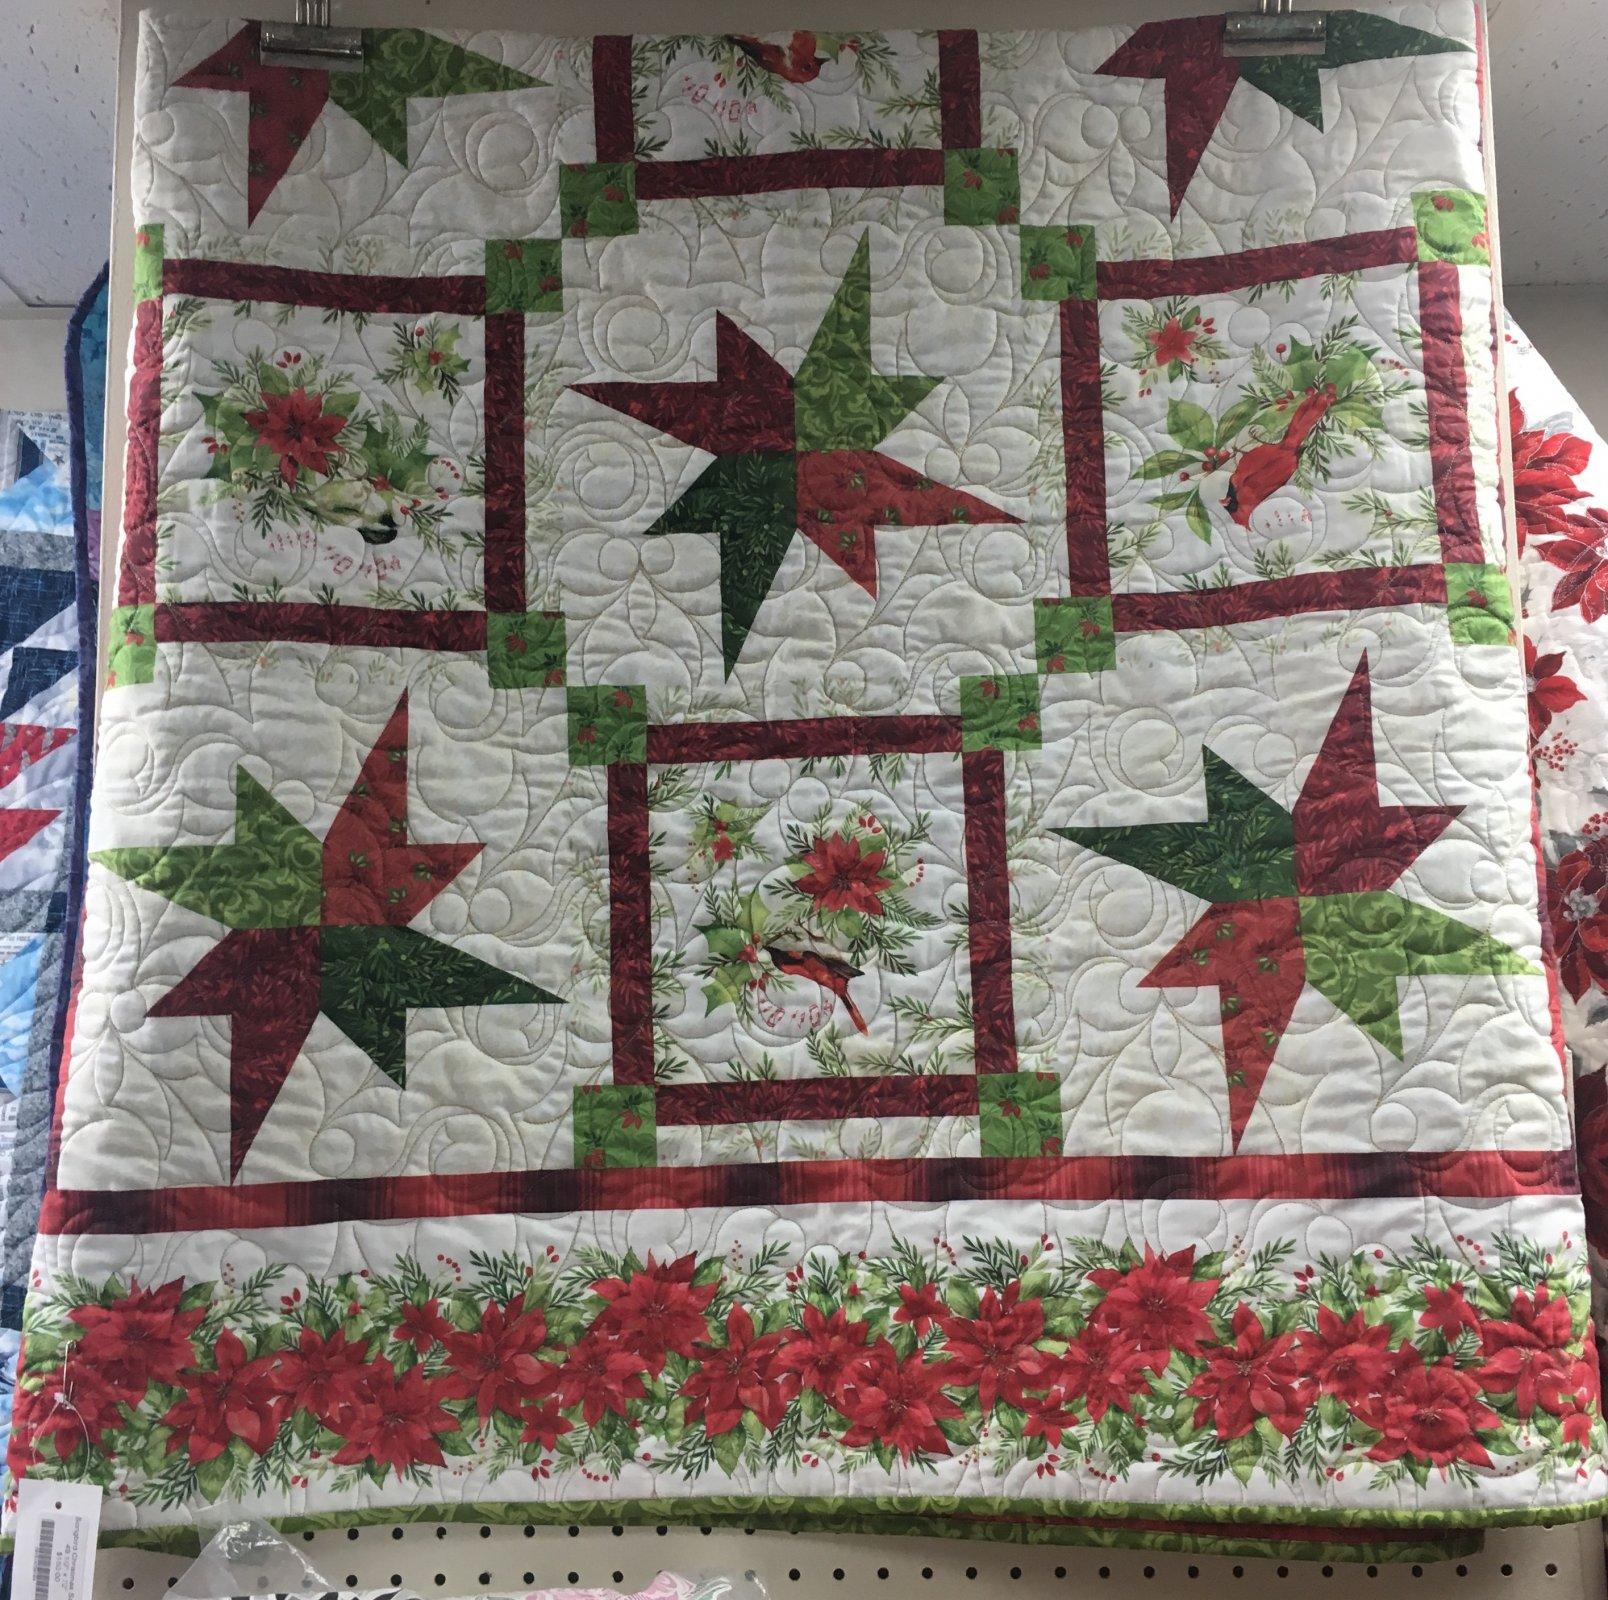 Soongbird Christmas Sample  -  49 1/2 x 72